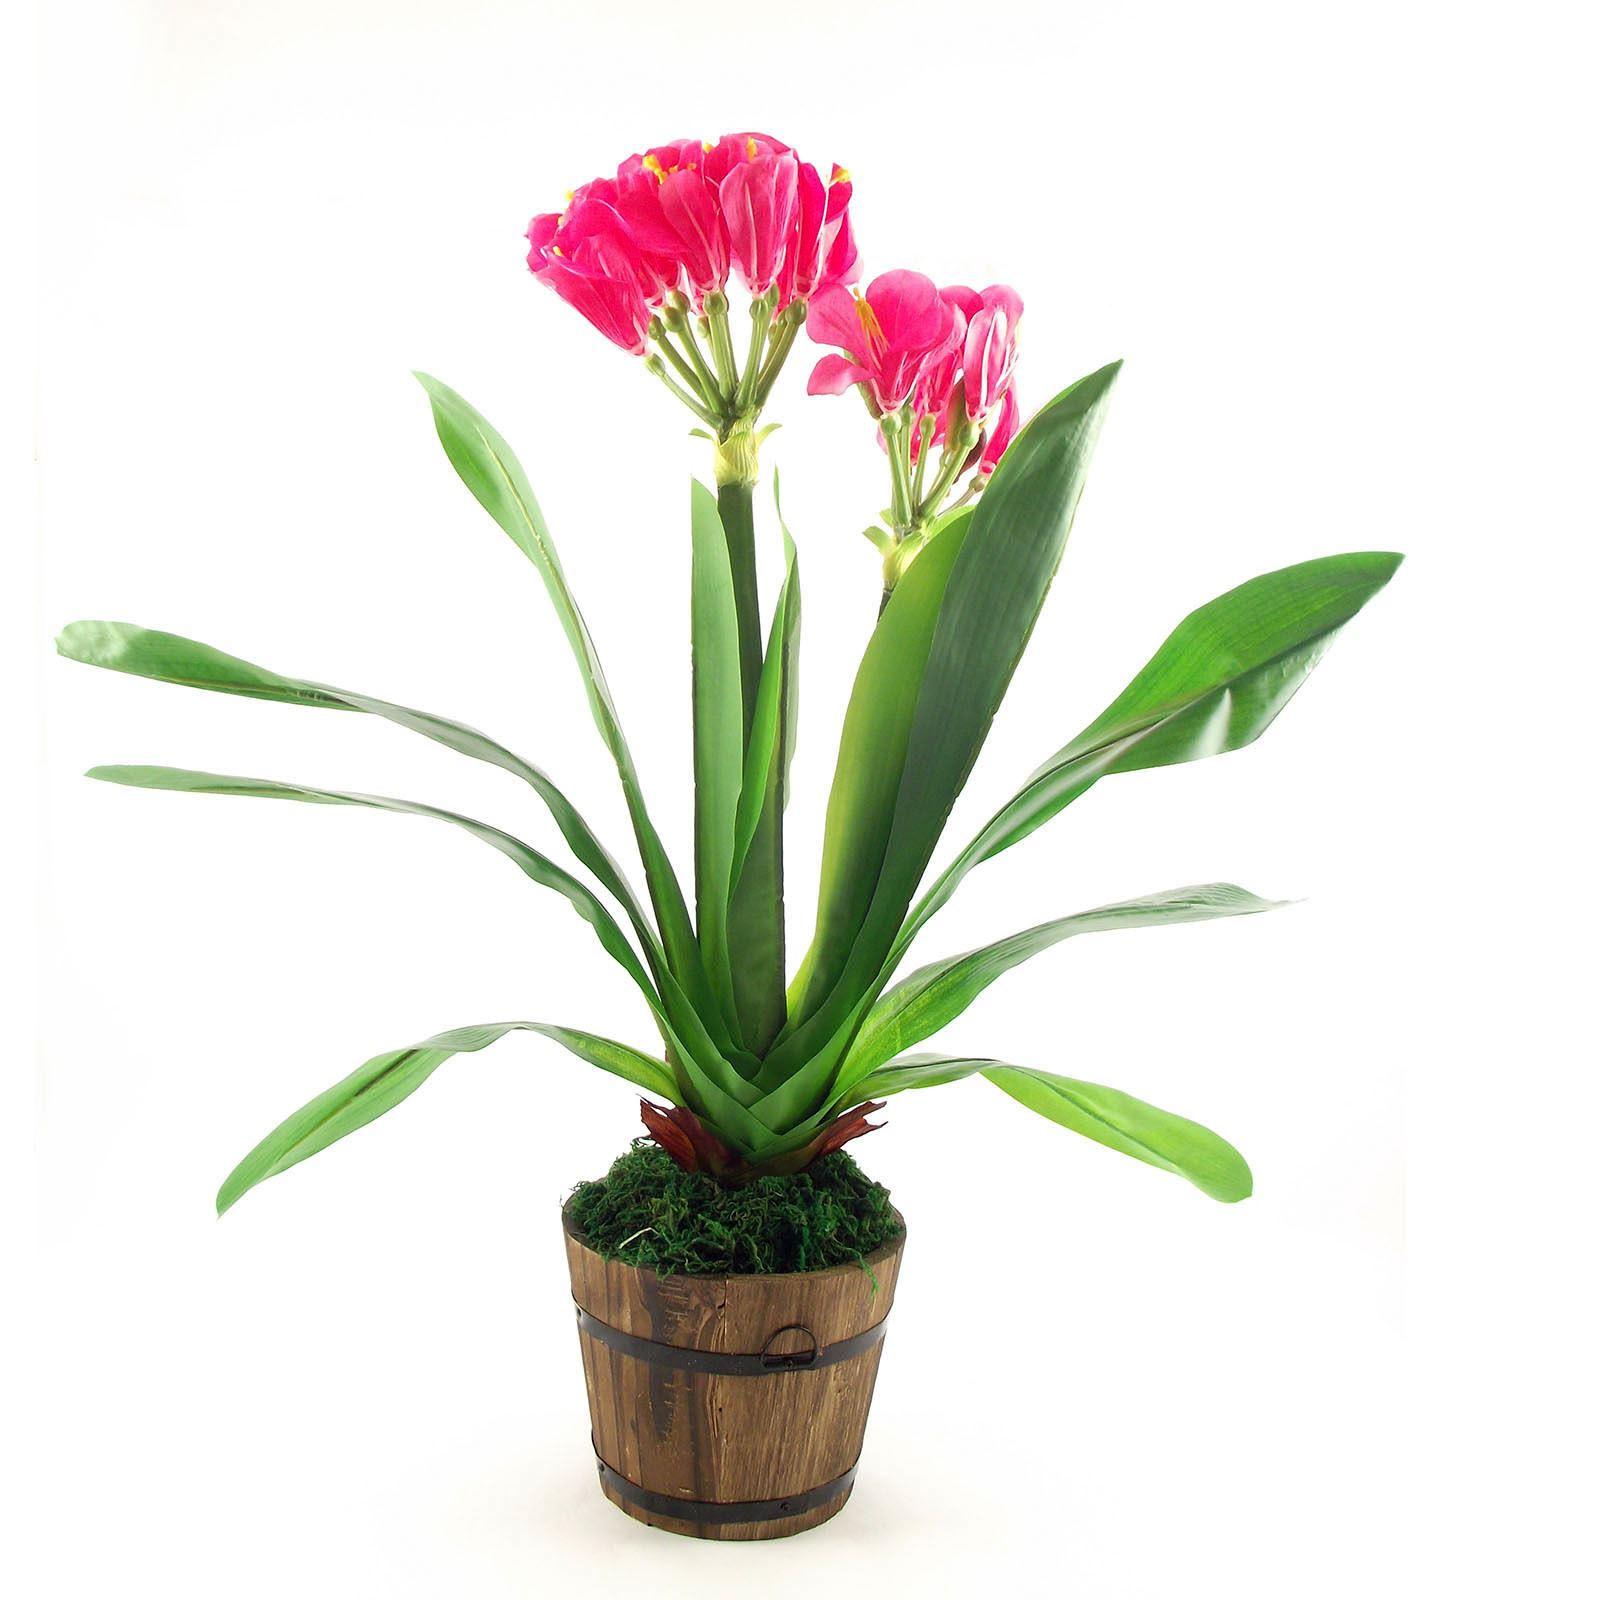 Large tropical flower plant tree home fake silk artificial bird of paradise ebay - Plant de rhubarbe a vendre ...